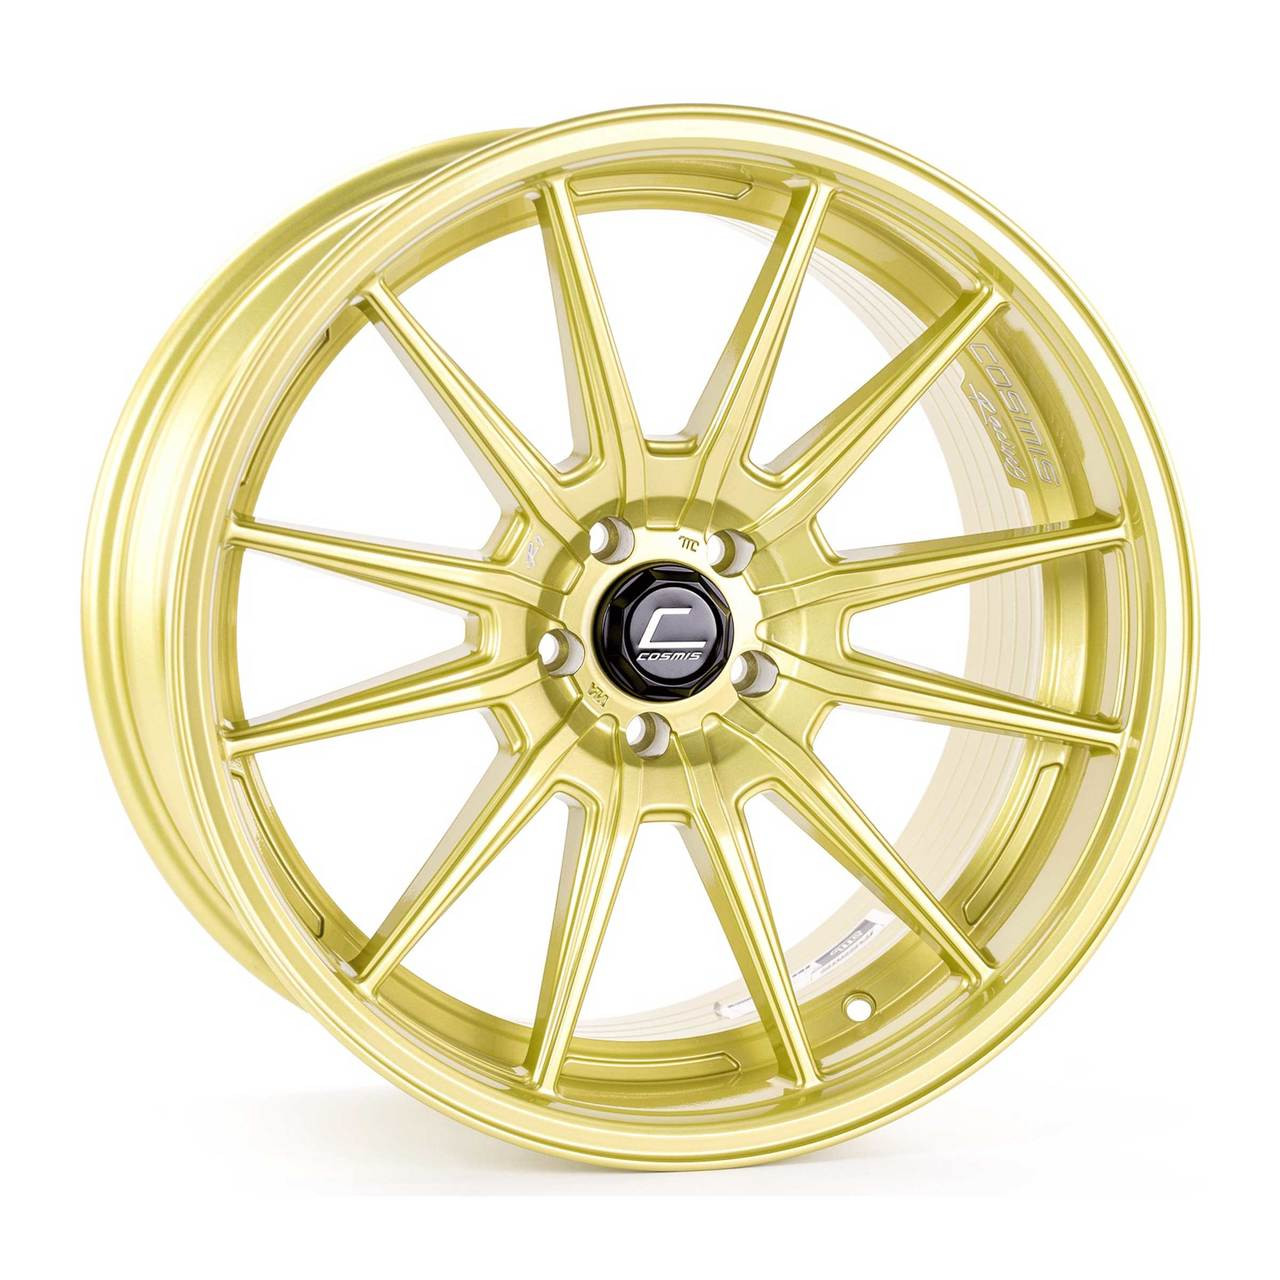 Gold Cosmis R1 Pro Wheel